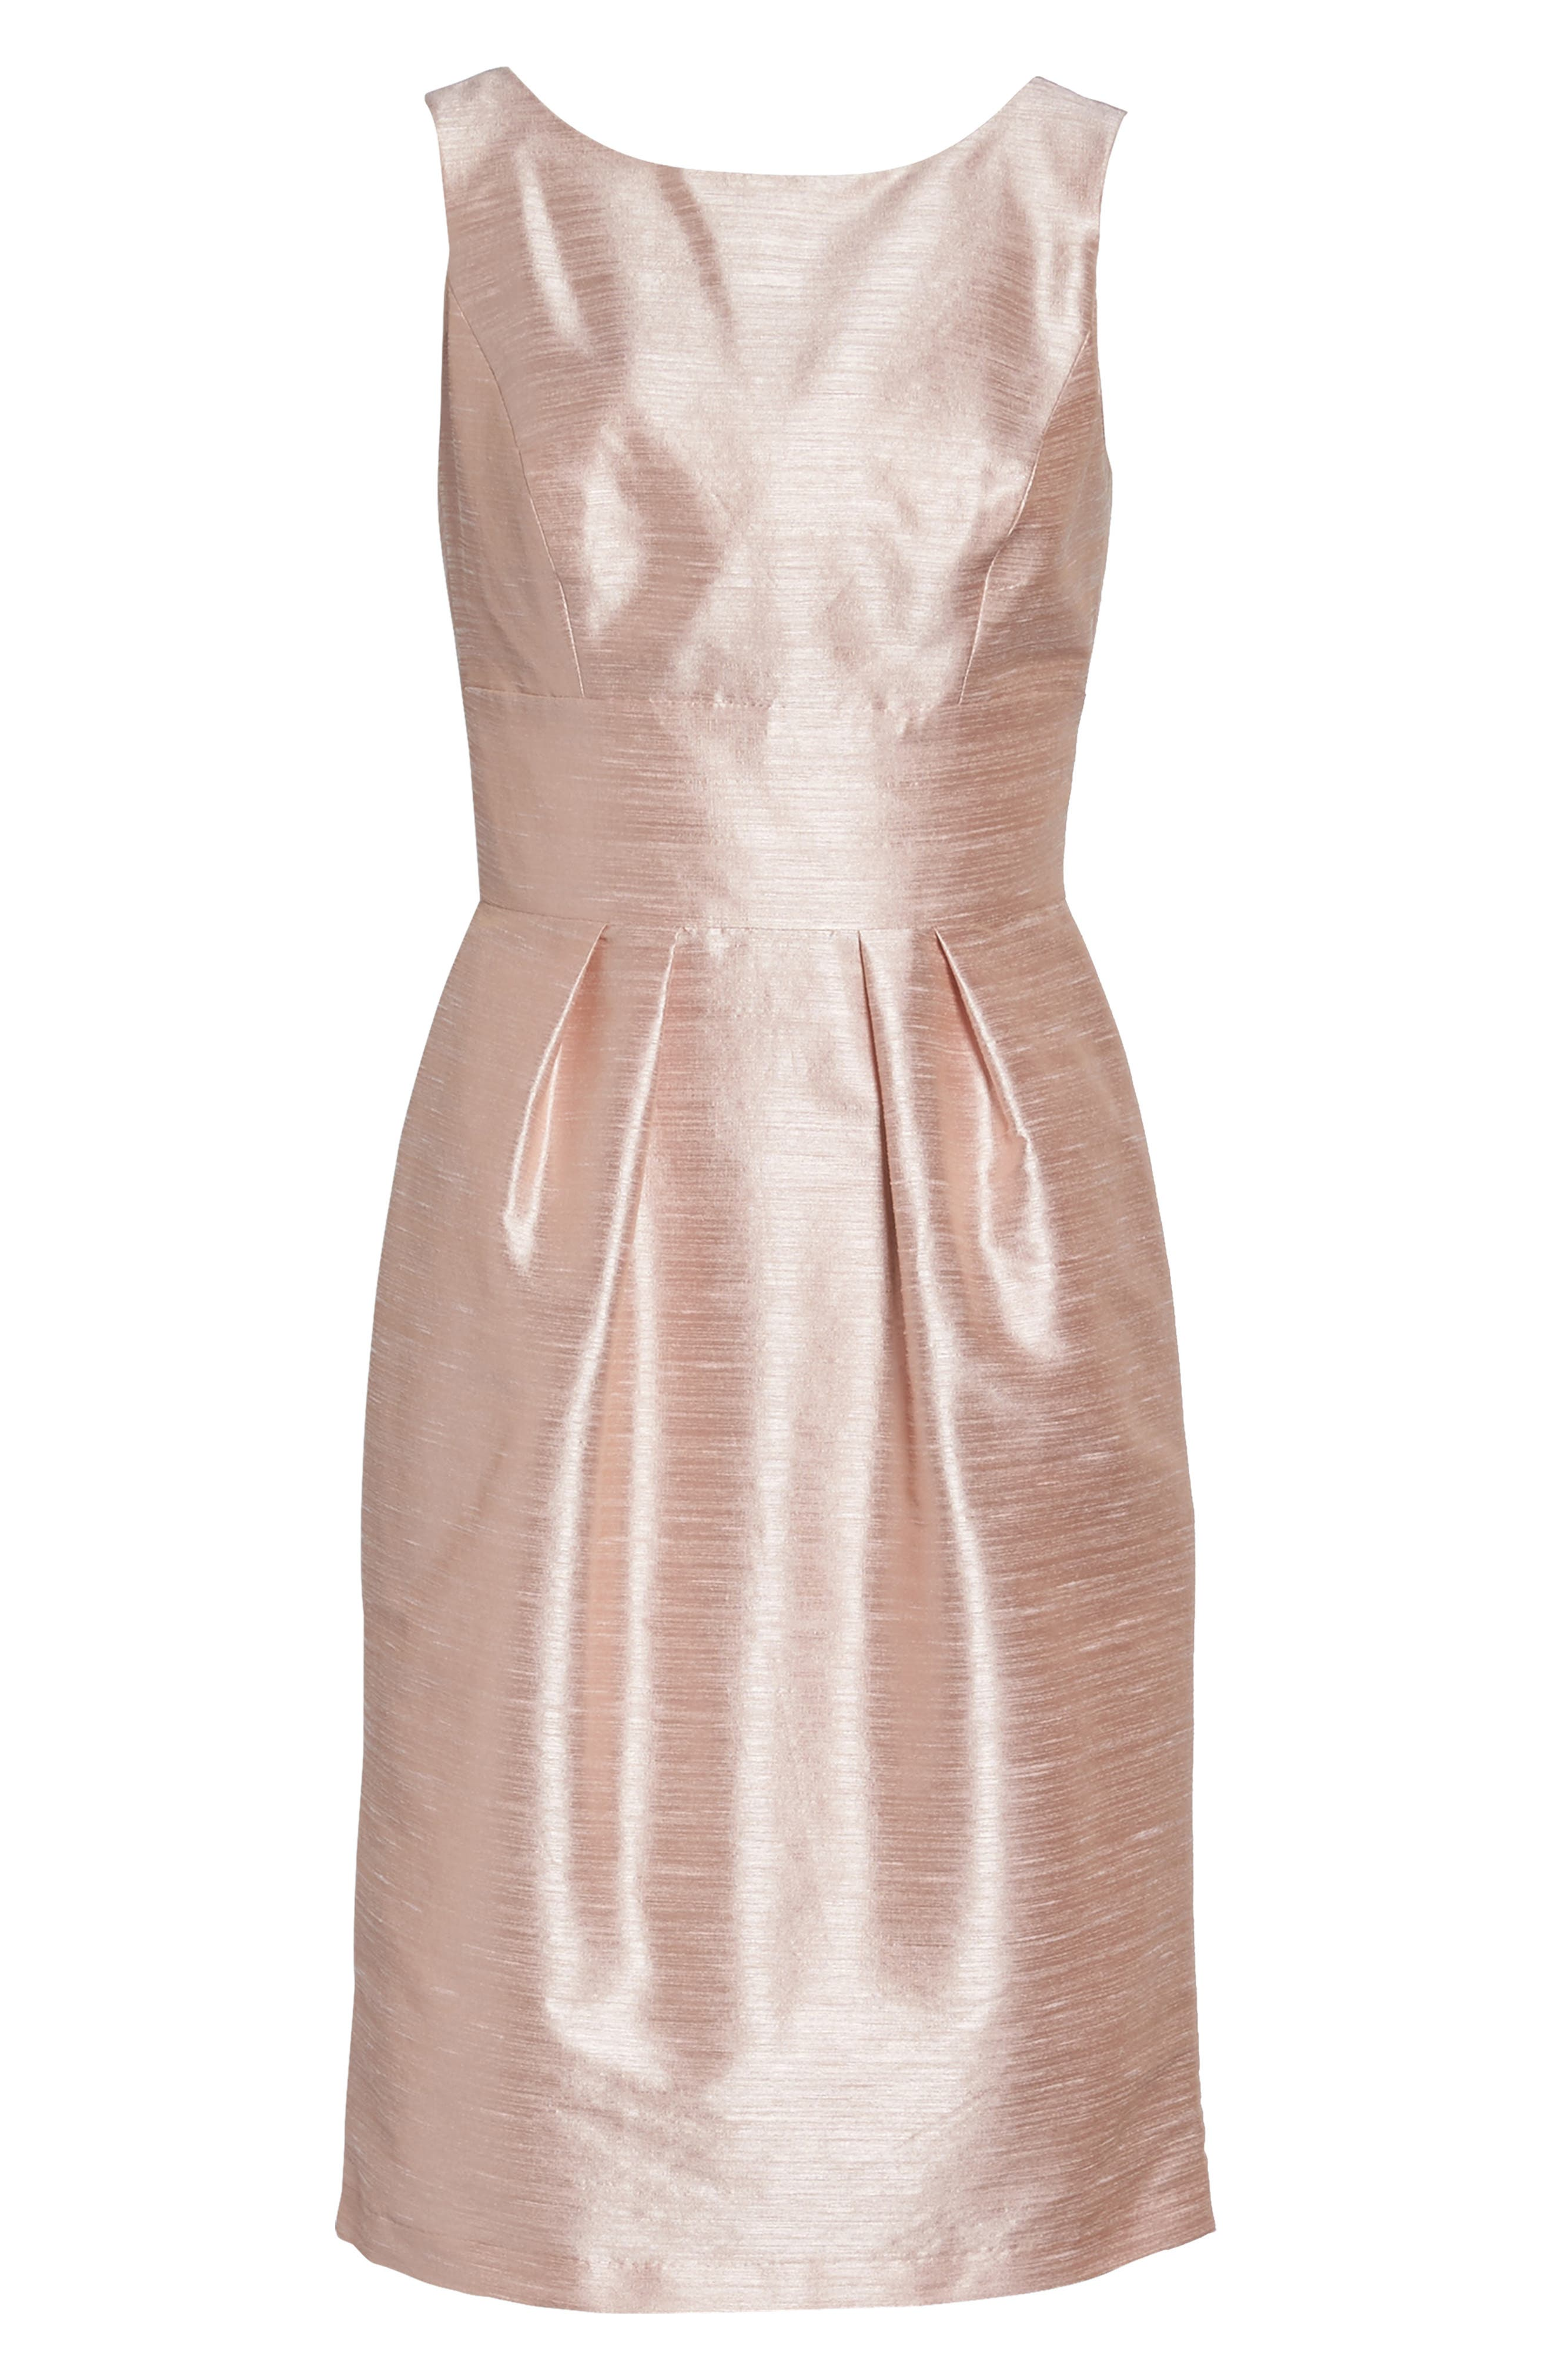 Boatneck Sheath Dress,                             Alternate thumbnail 6, color,                             Pearl Pink